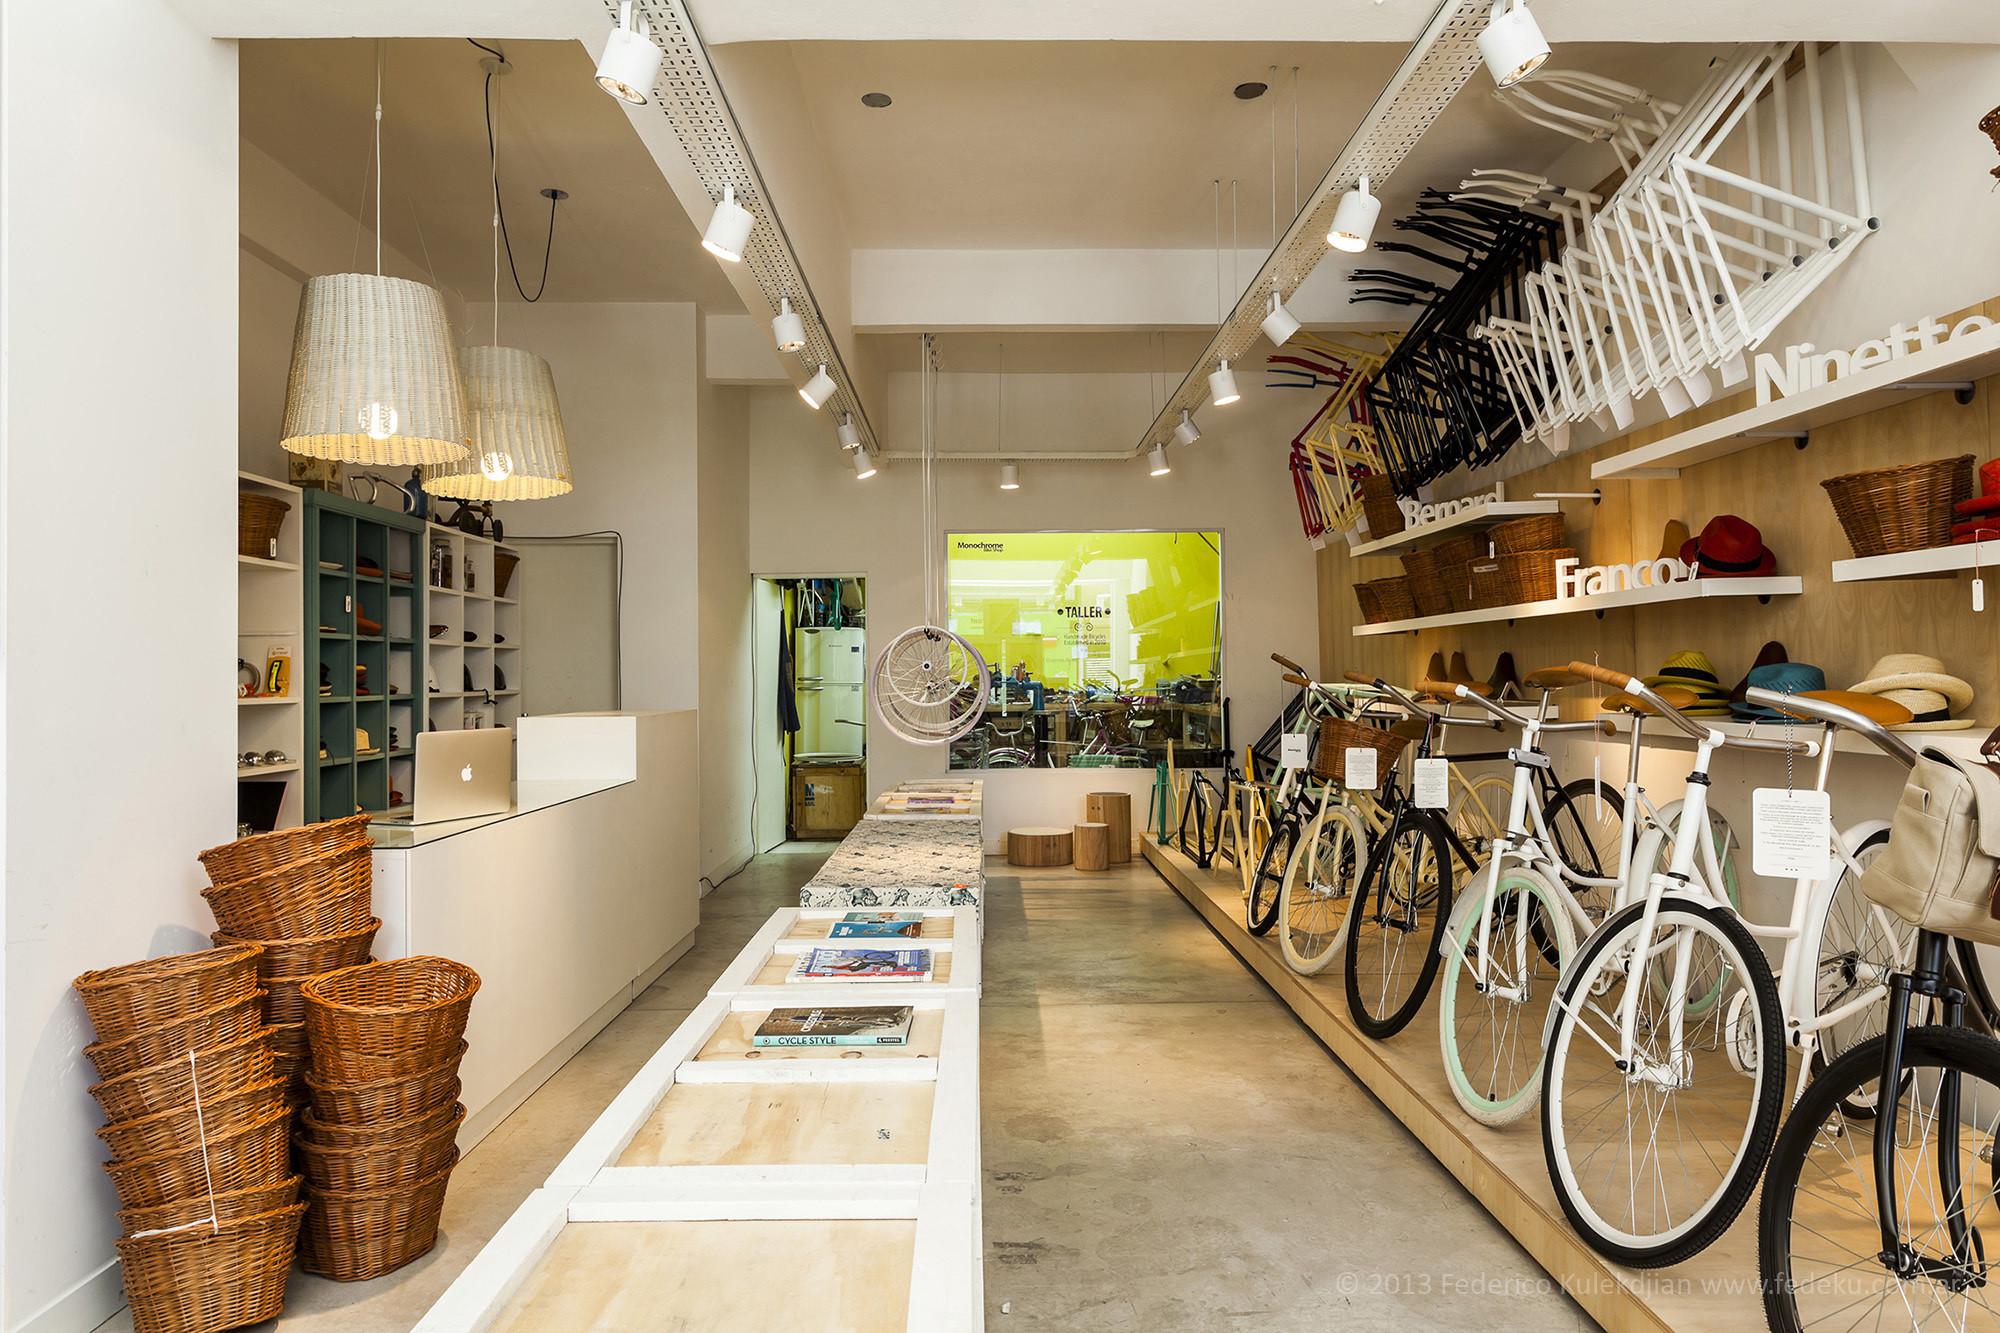 Archivo Arquitectura Para Bicicletas Archdaily Colombia # Muebles Bicicleta